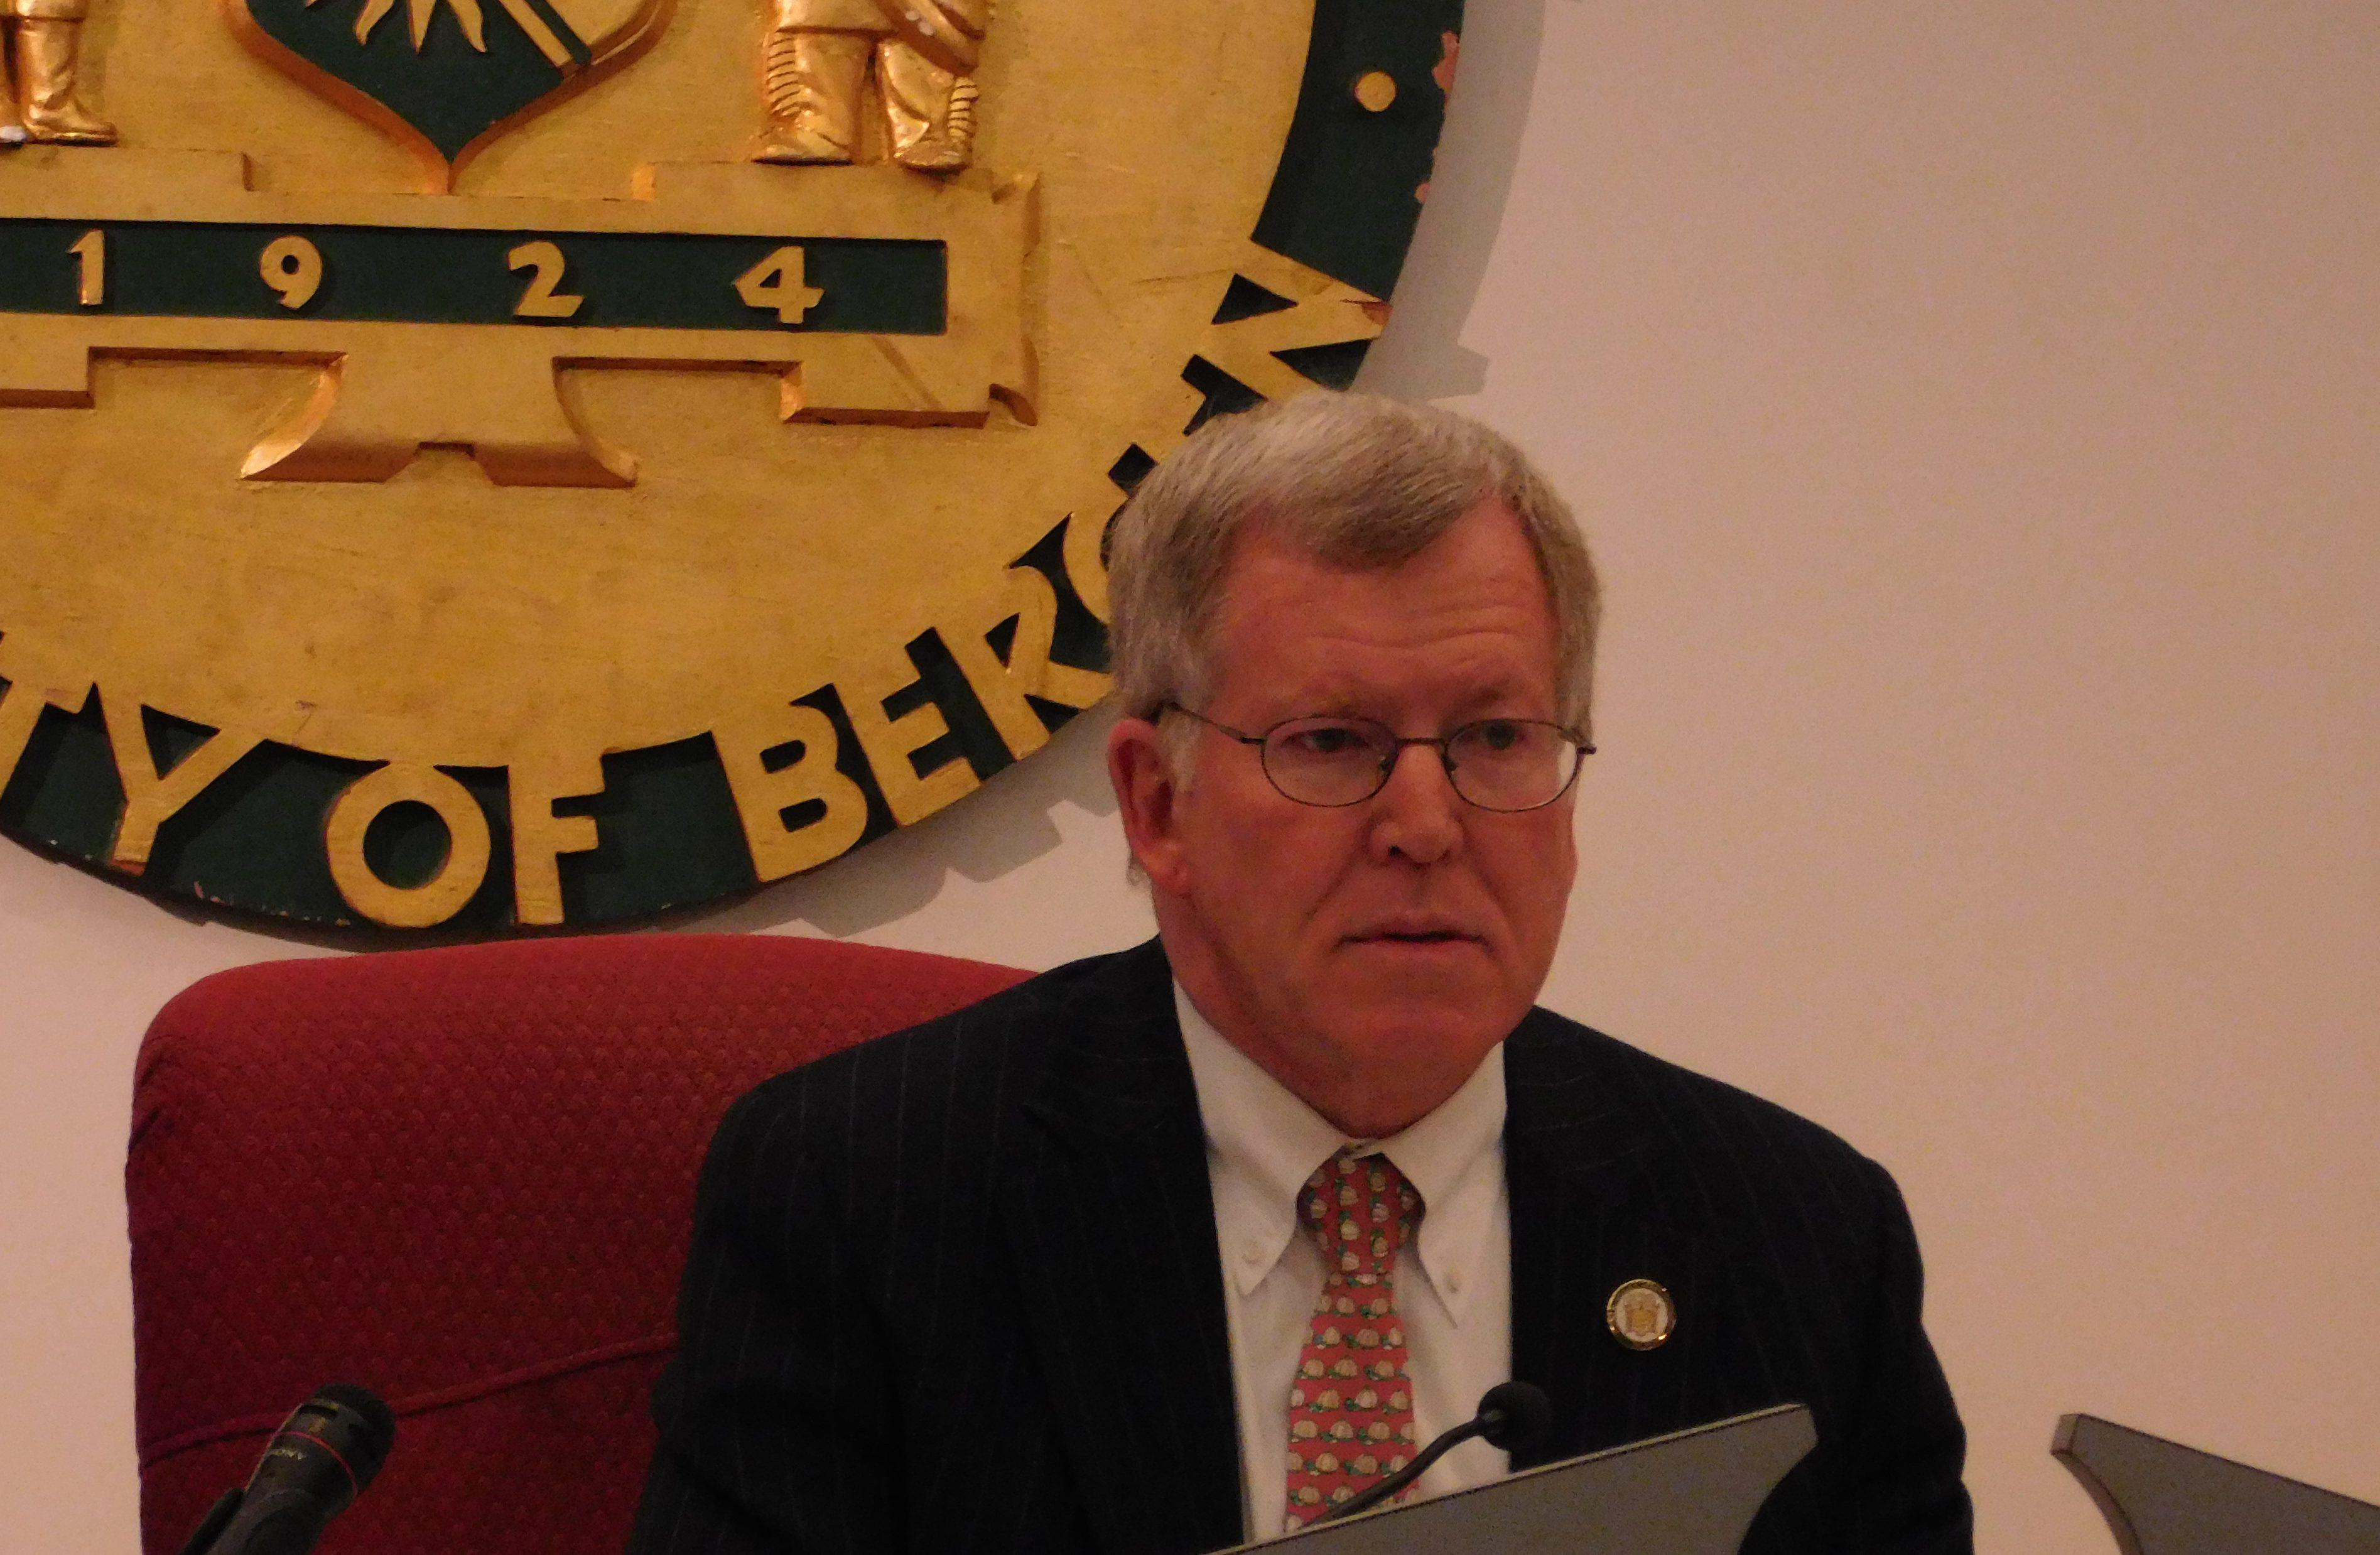 Senator Bob Gordon is the chairman.